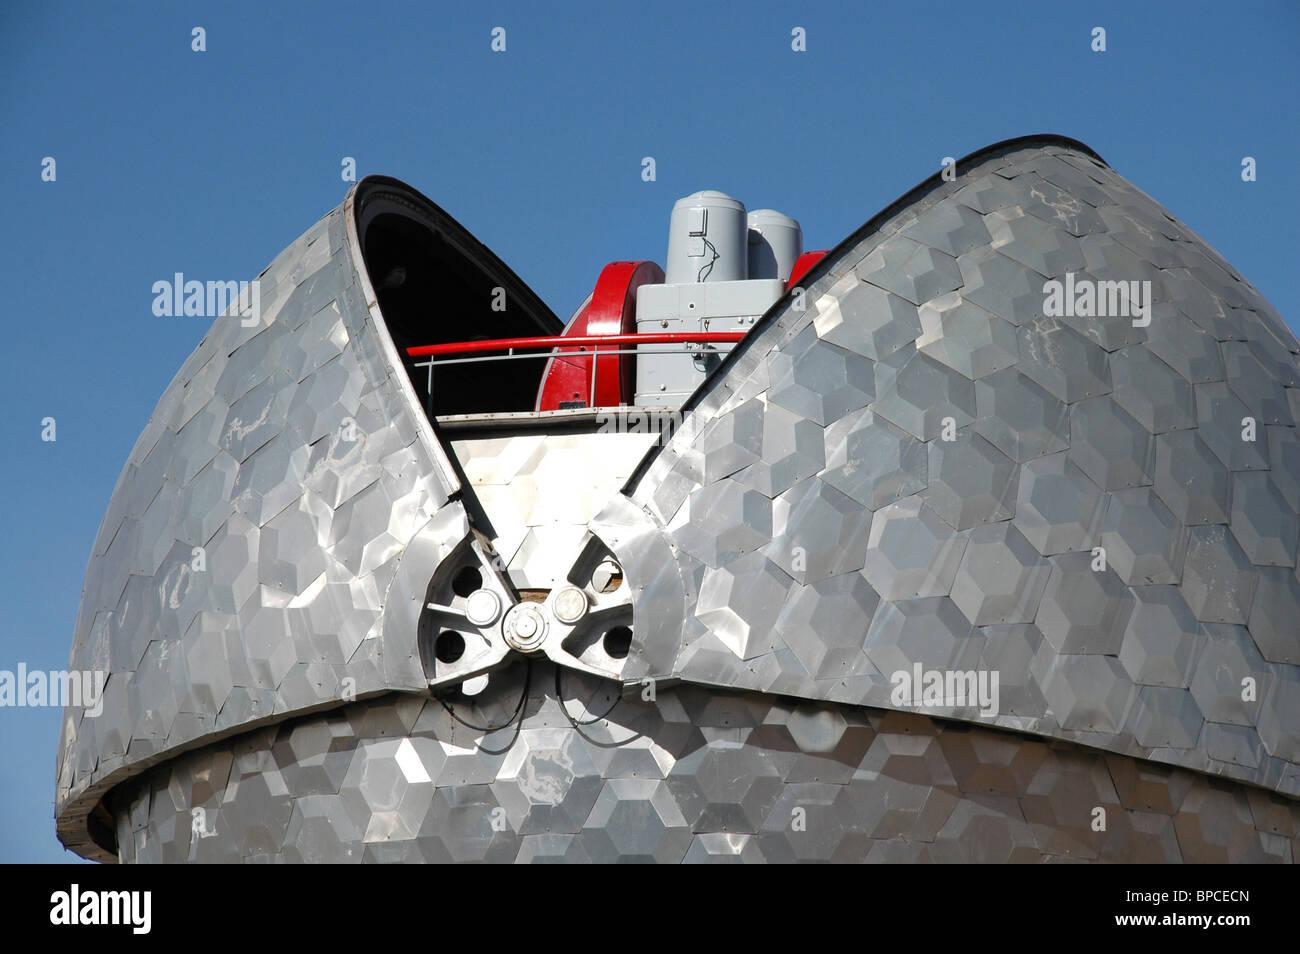 Okno Space Monitoring Facility - Stock Image